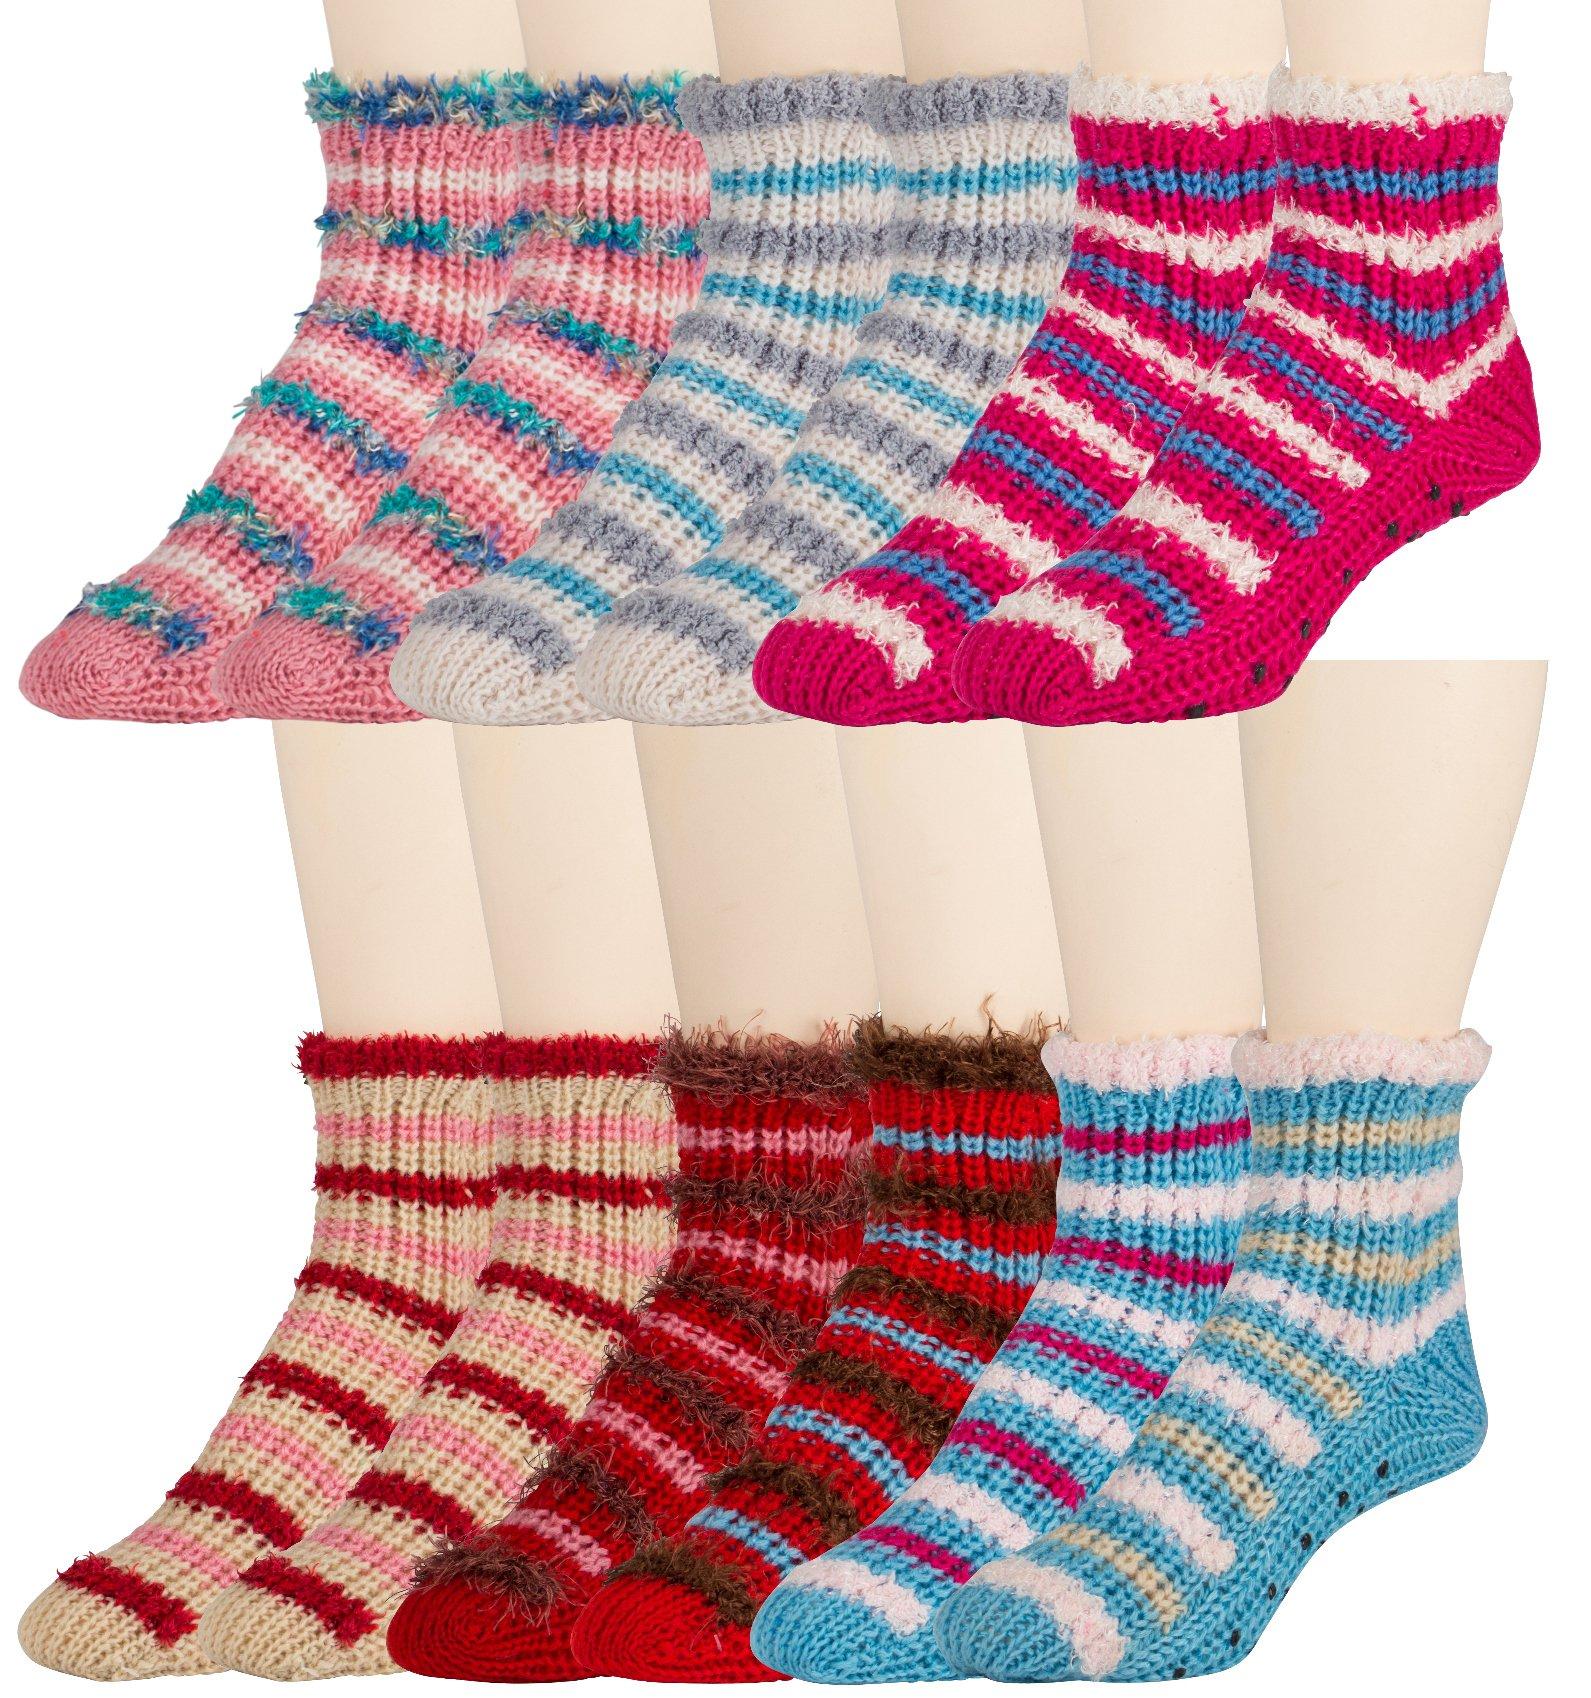 6 Pairs of Ladies Heavy Knit Snow Flake Reindeer Print Slipper Sock With Gripper Bottom (Assorted B)